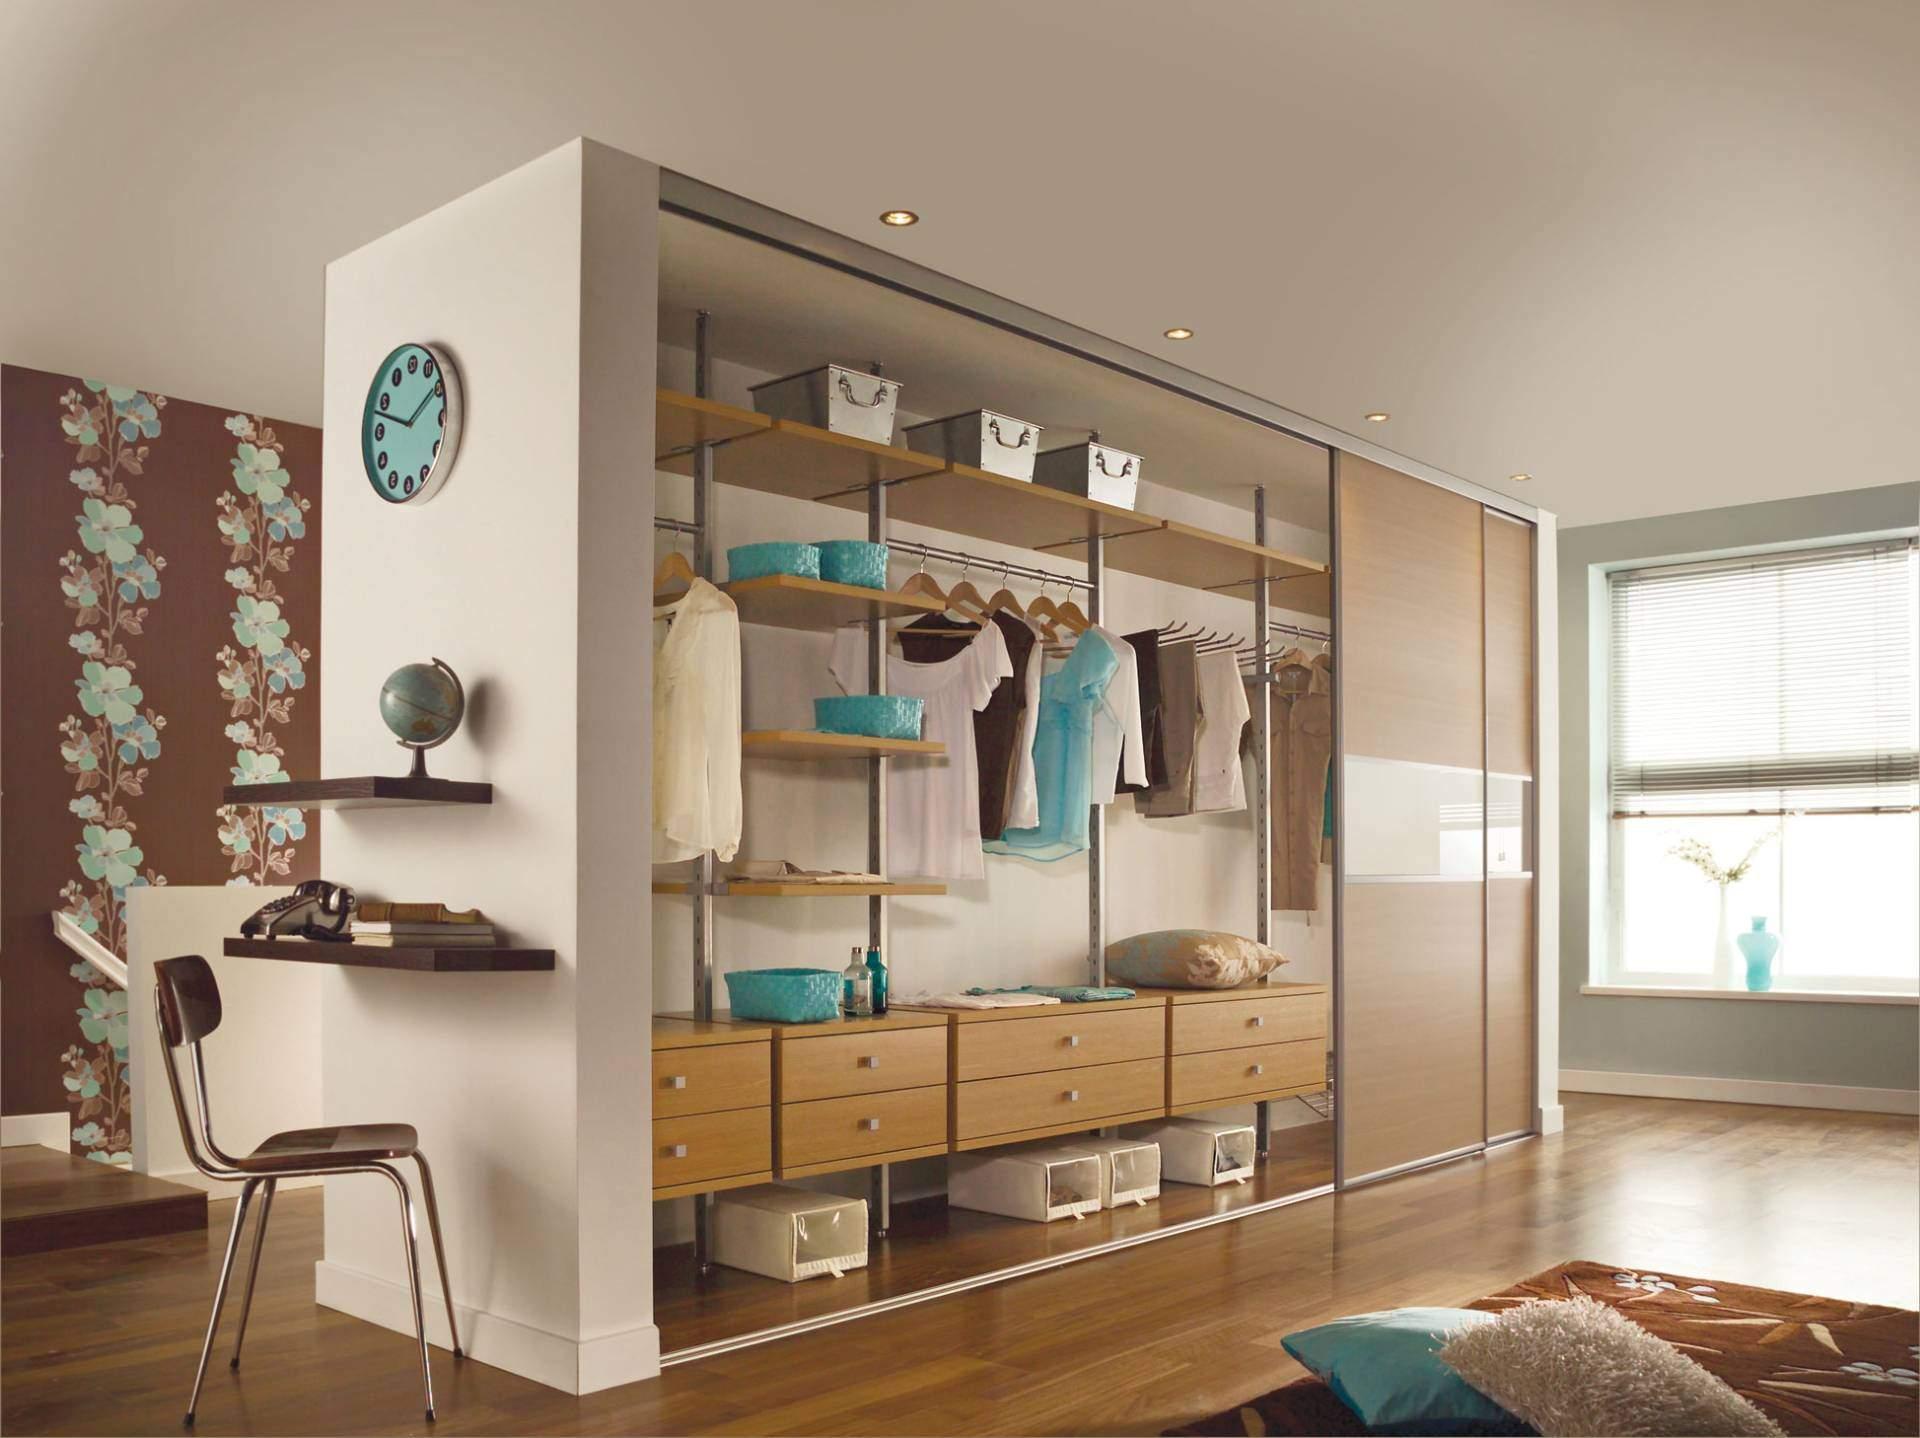 Шкаф разделяет пространство комнаты